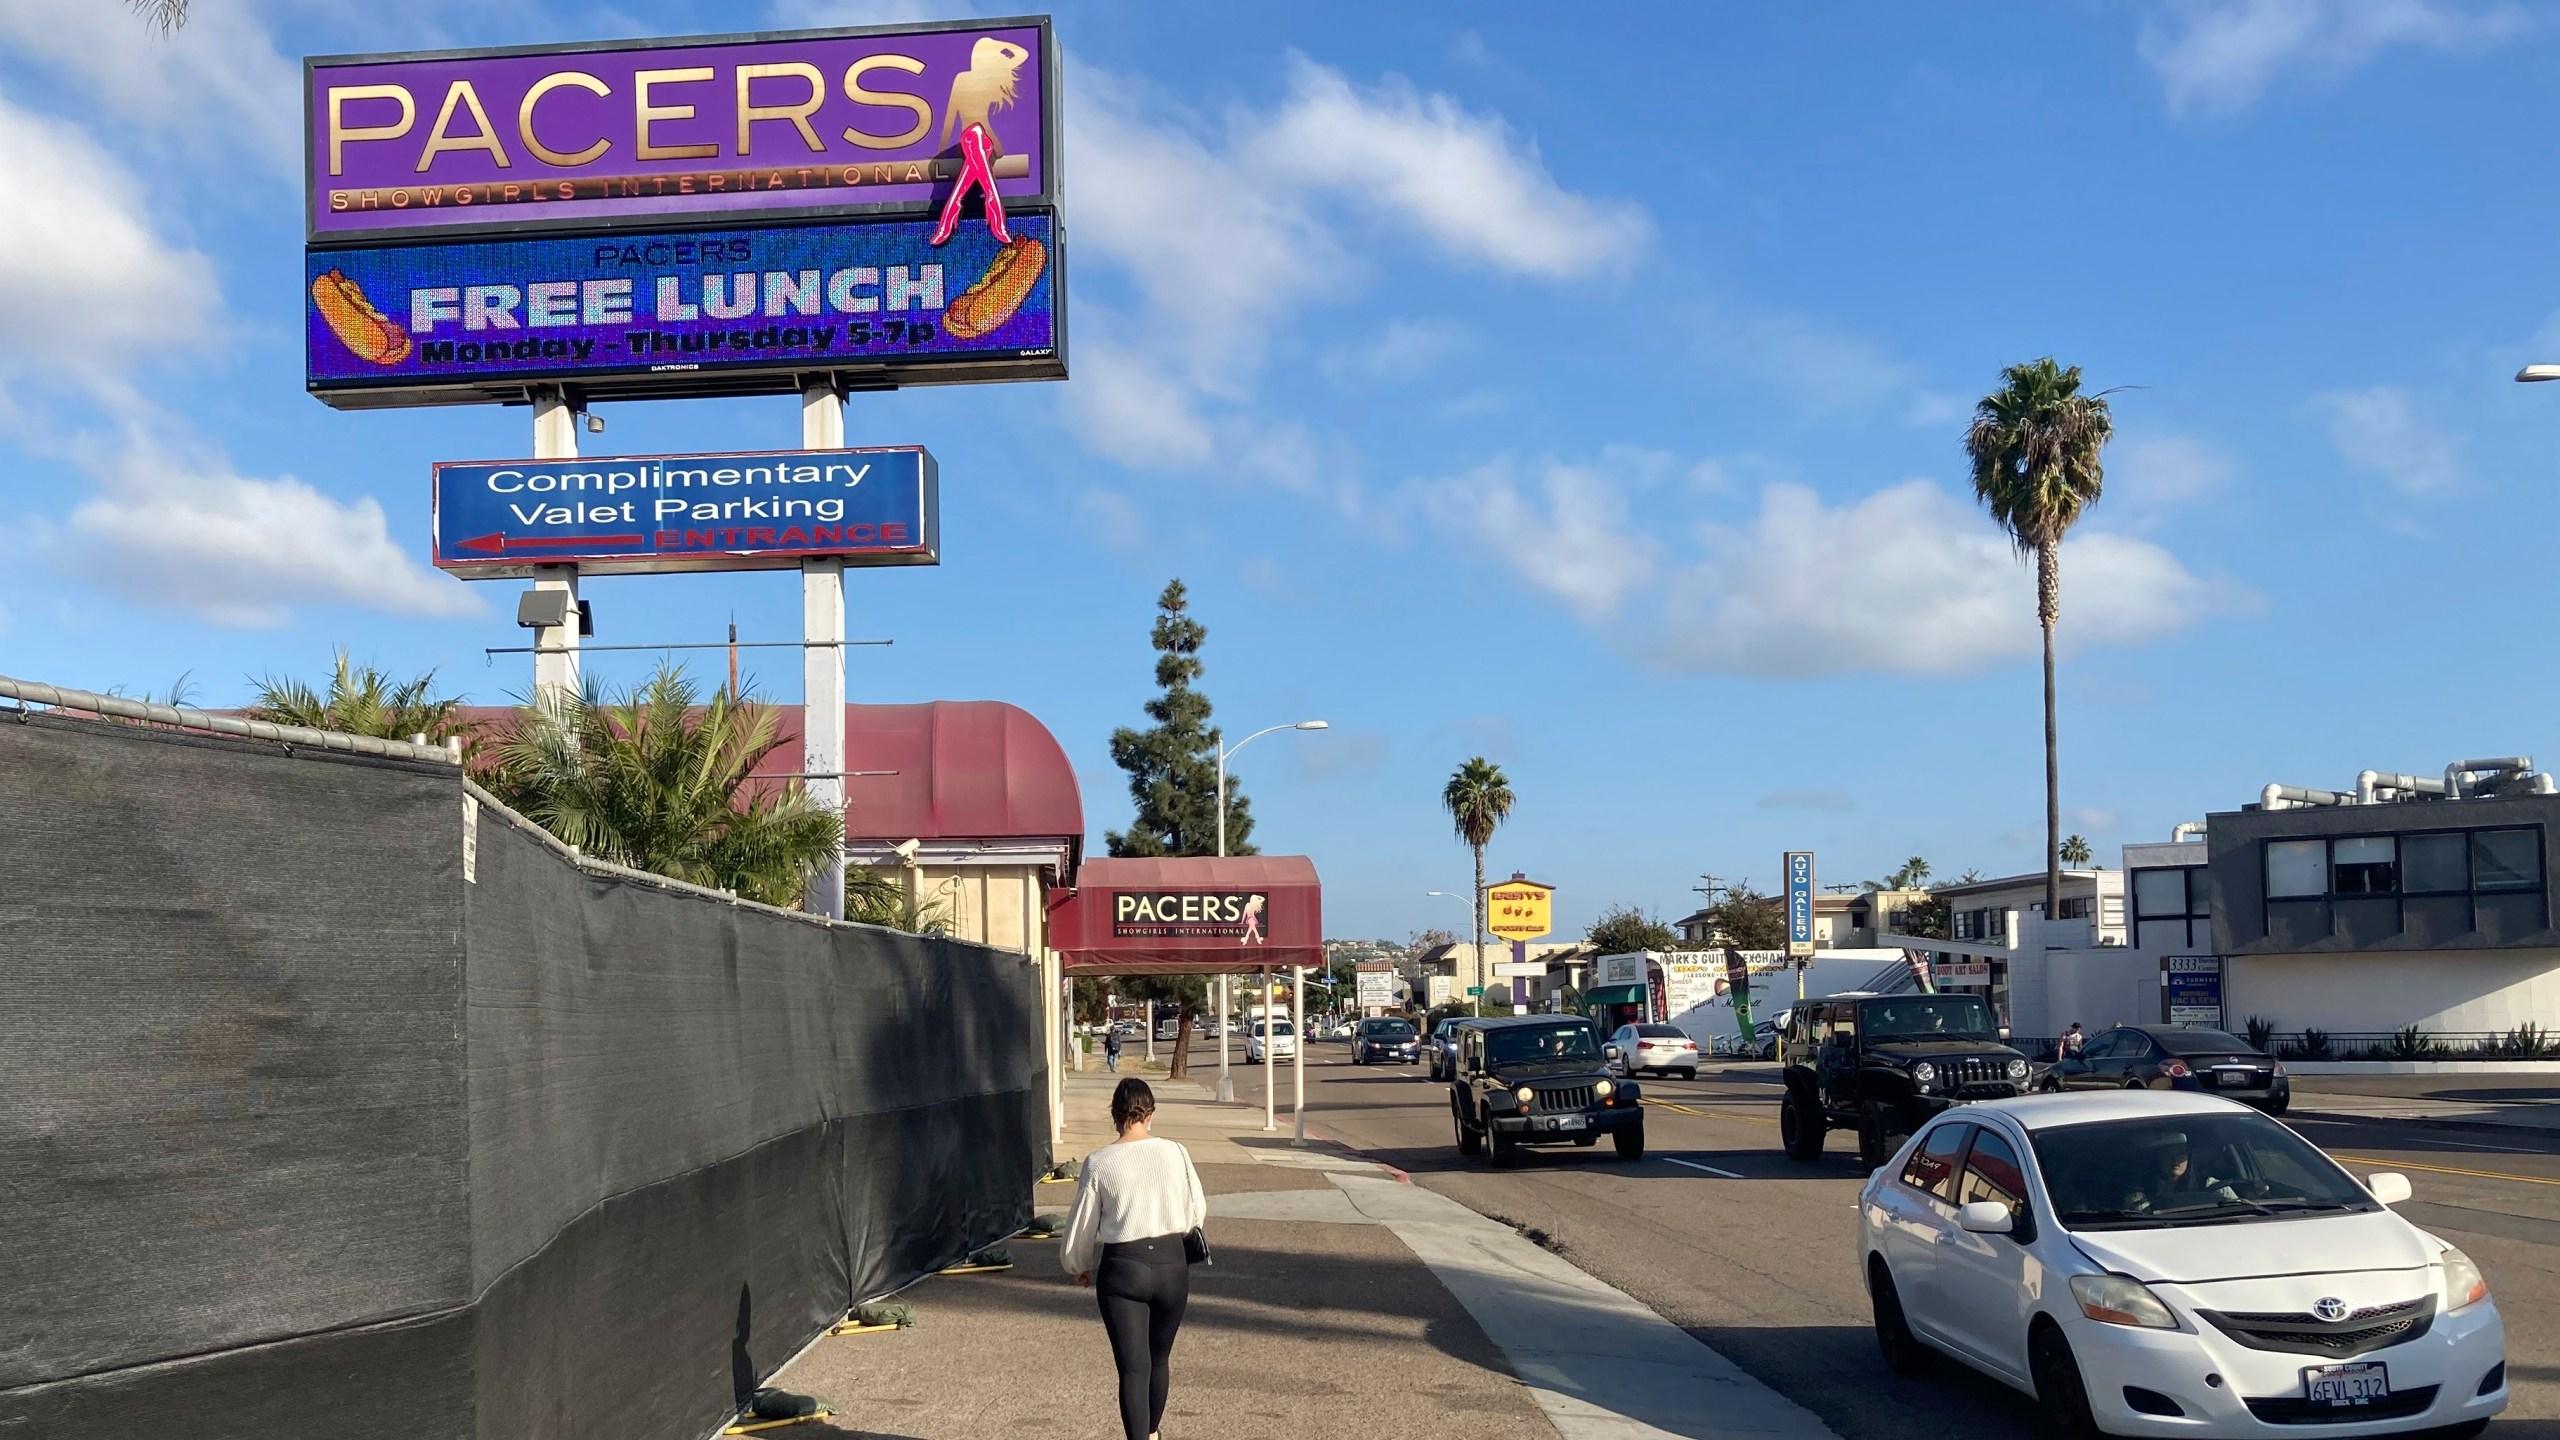 A pedestrian walks past Pacers Showgirls International in San Diego, on Thursday, Dec. 10, 2020. (Elliot Spagat/AP Photo)